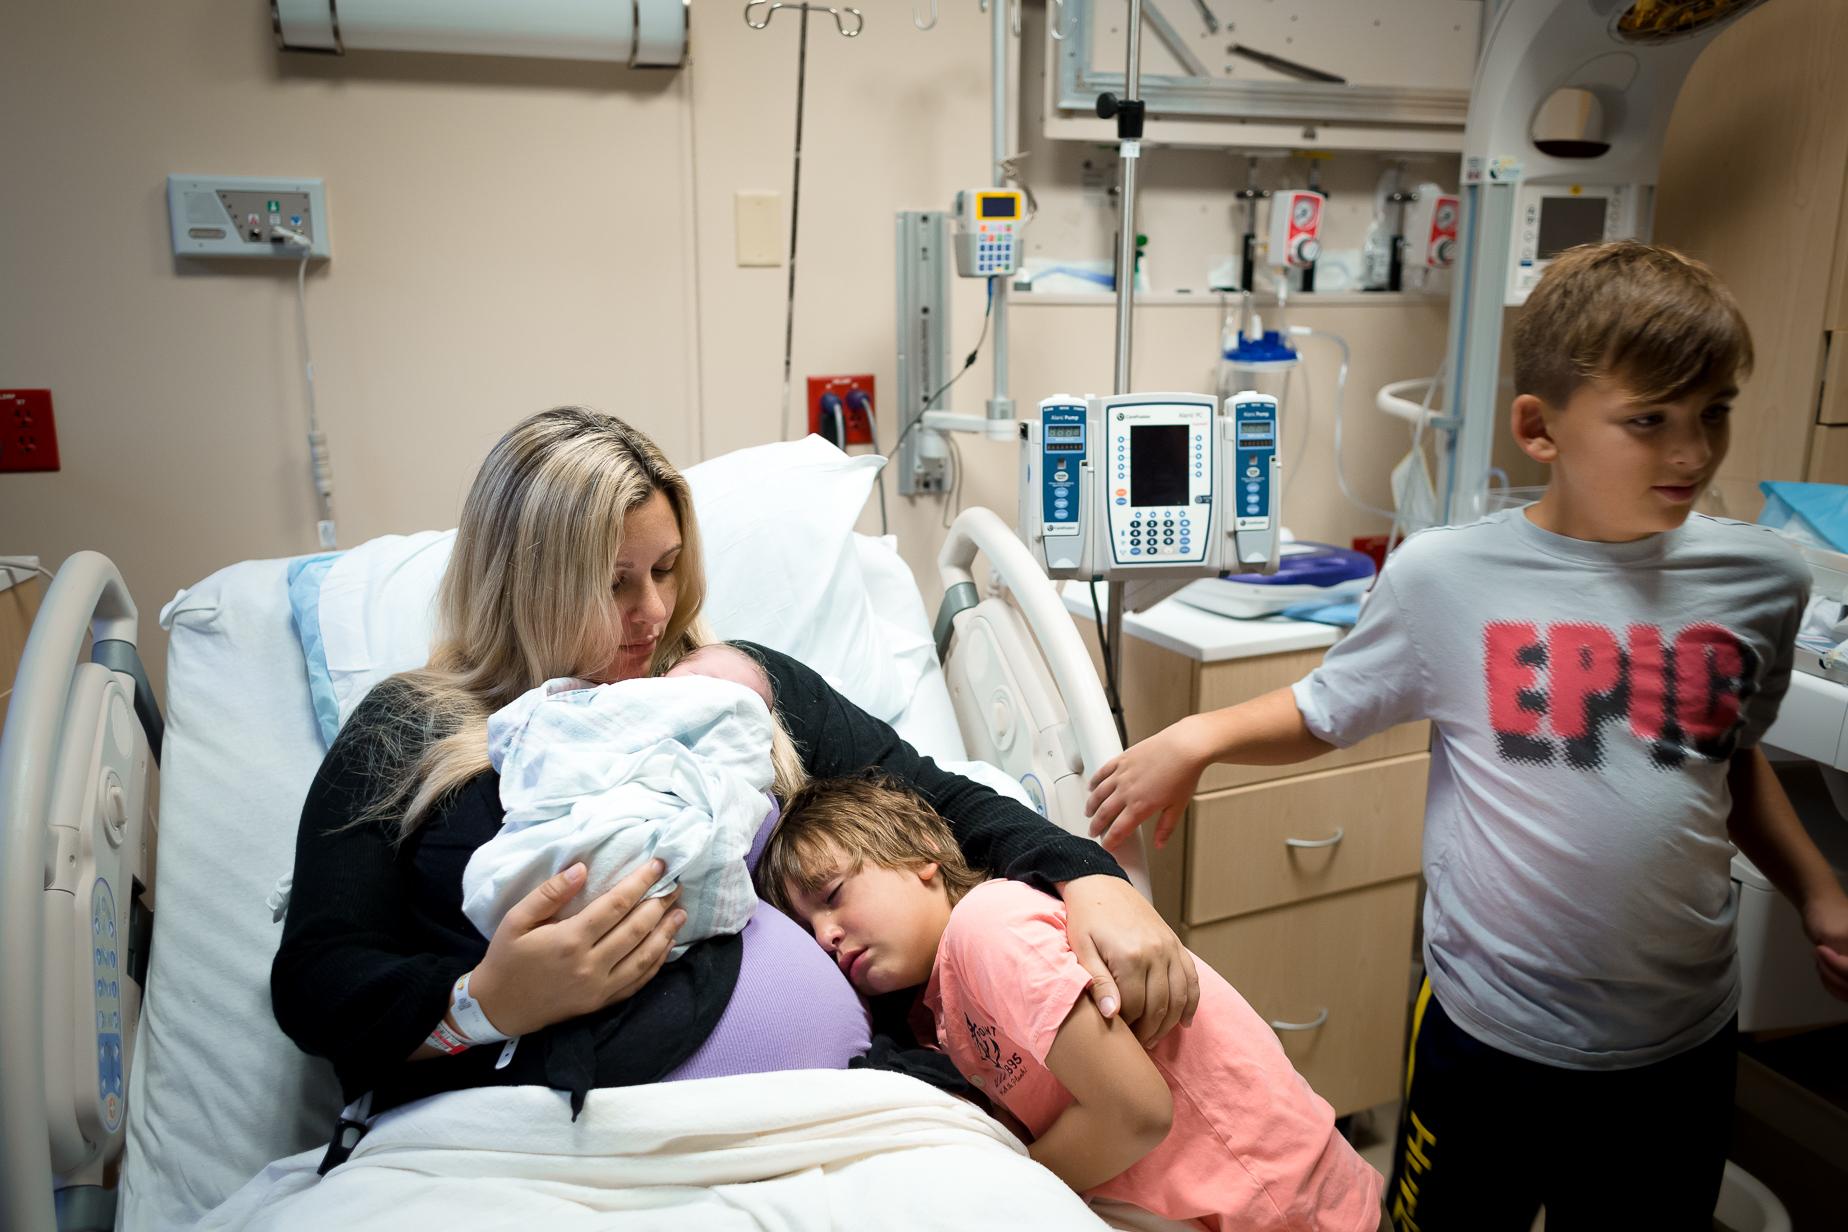 west-boca-hospital-gentle-c-section-epidural-vbac-home-birth-mary-harris-palms-birth-house-center-34.jpg